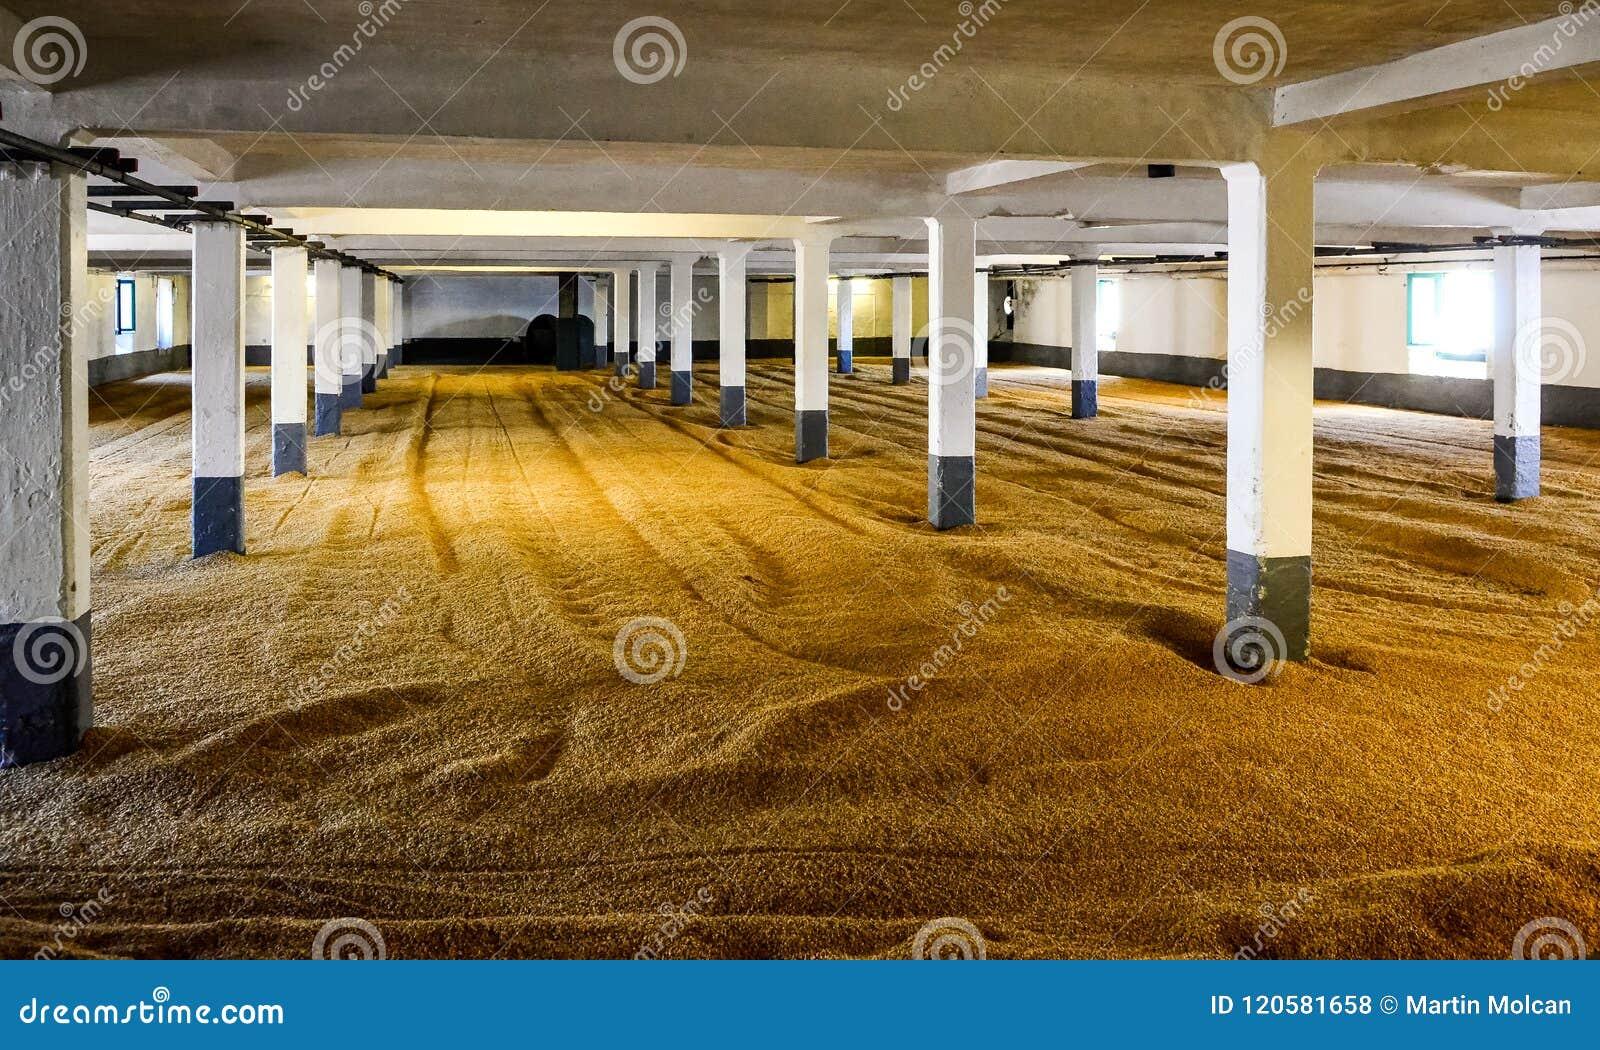 Barley malt on malting floor in distillery, Scotland